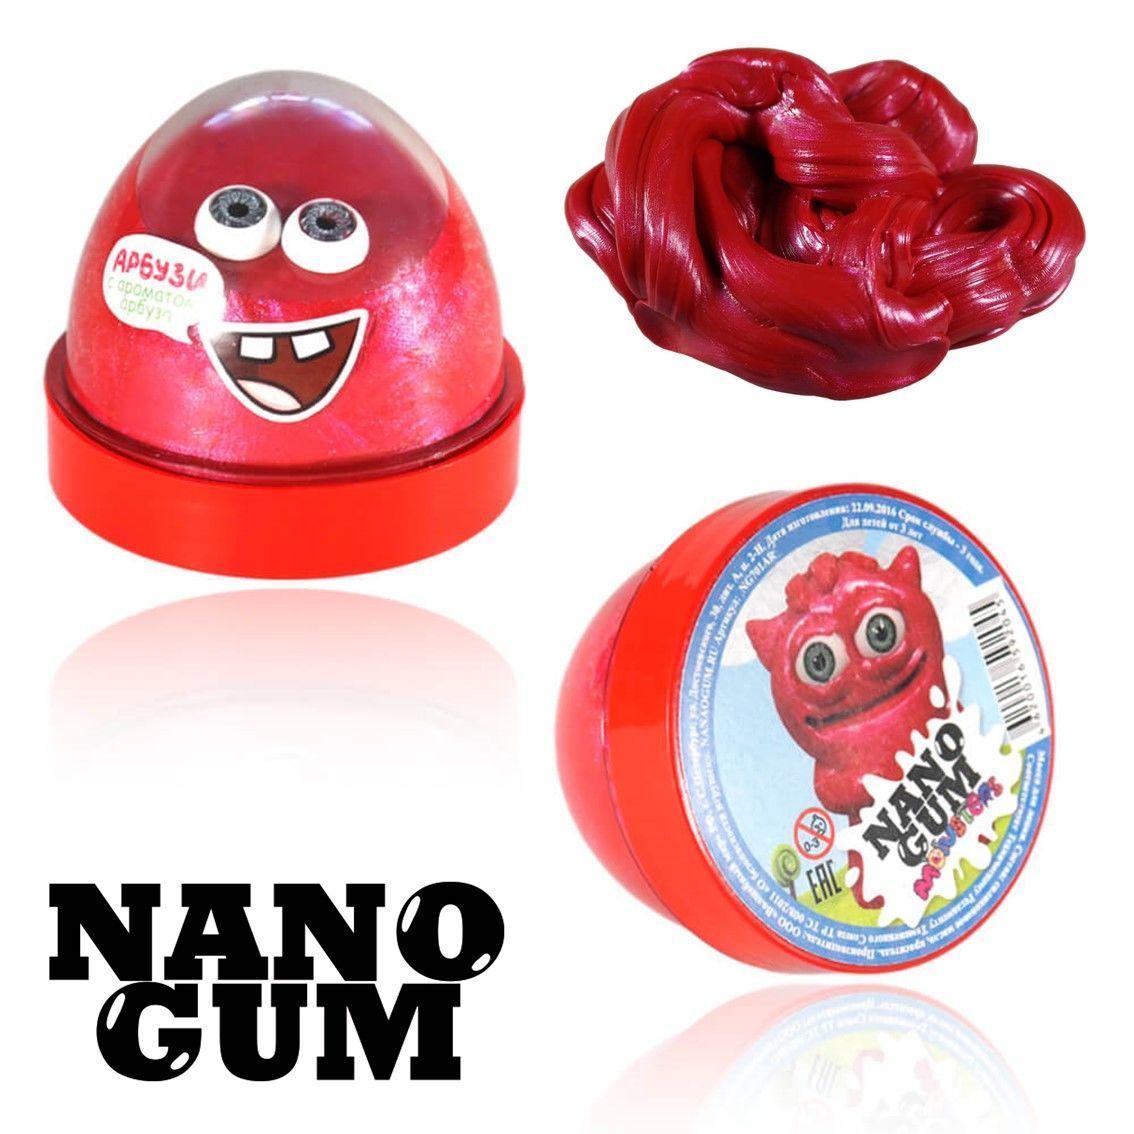 Жвачка для рук Nano gum Арбузи 50гр